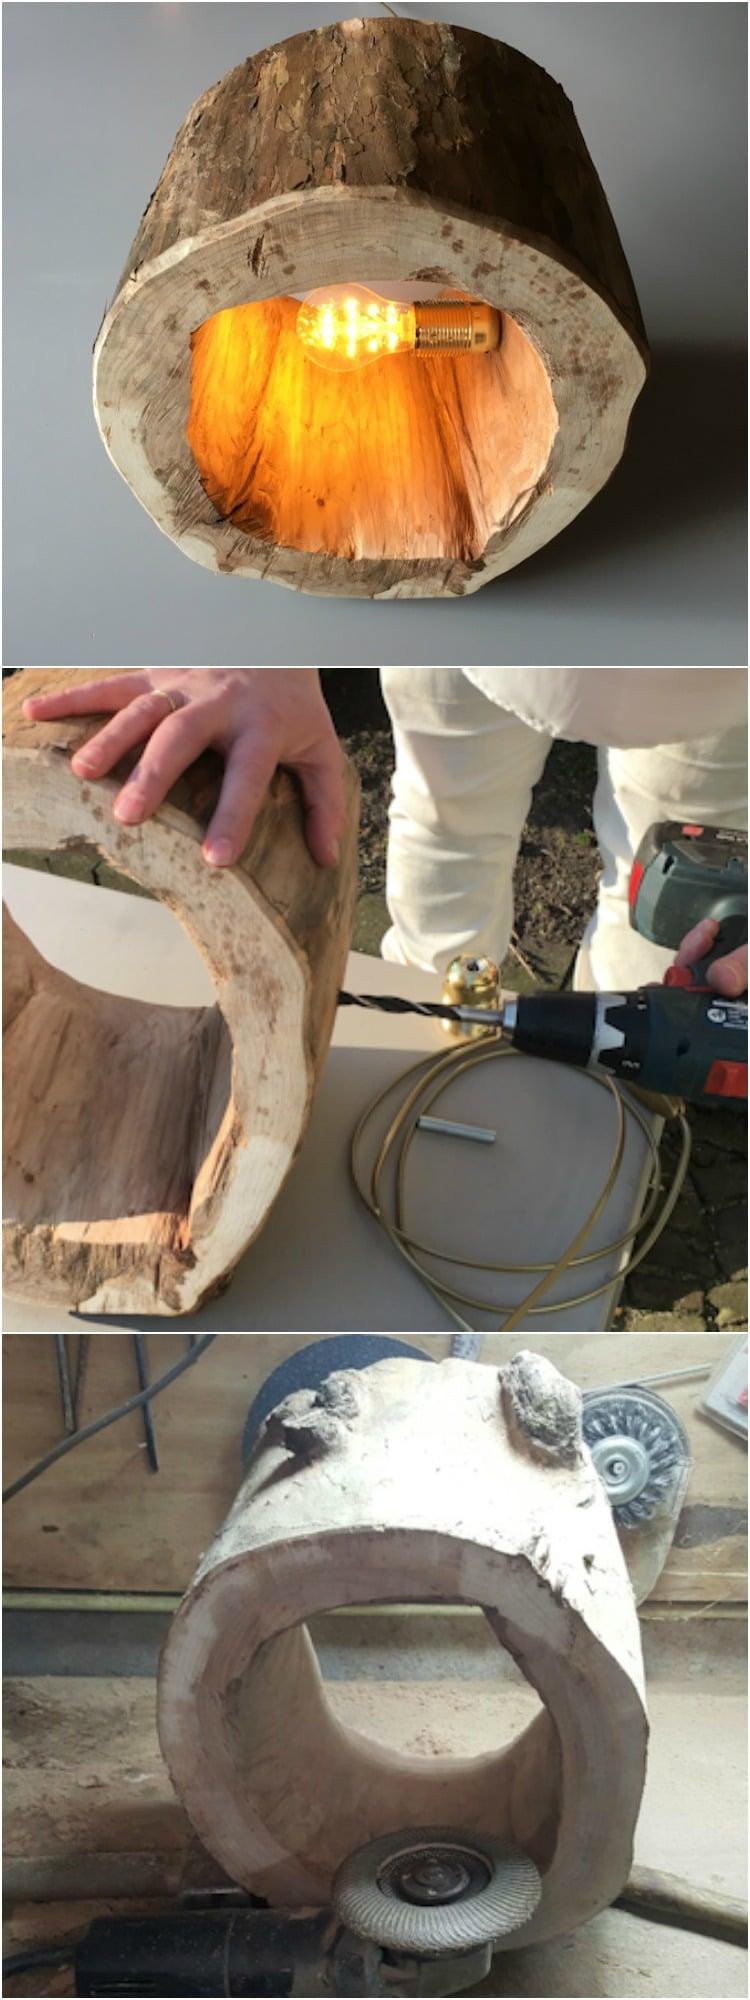 How to Make a Spectacular Stump Floor Lamp - wood-lamps, restaurant-bar, floor-lamps